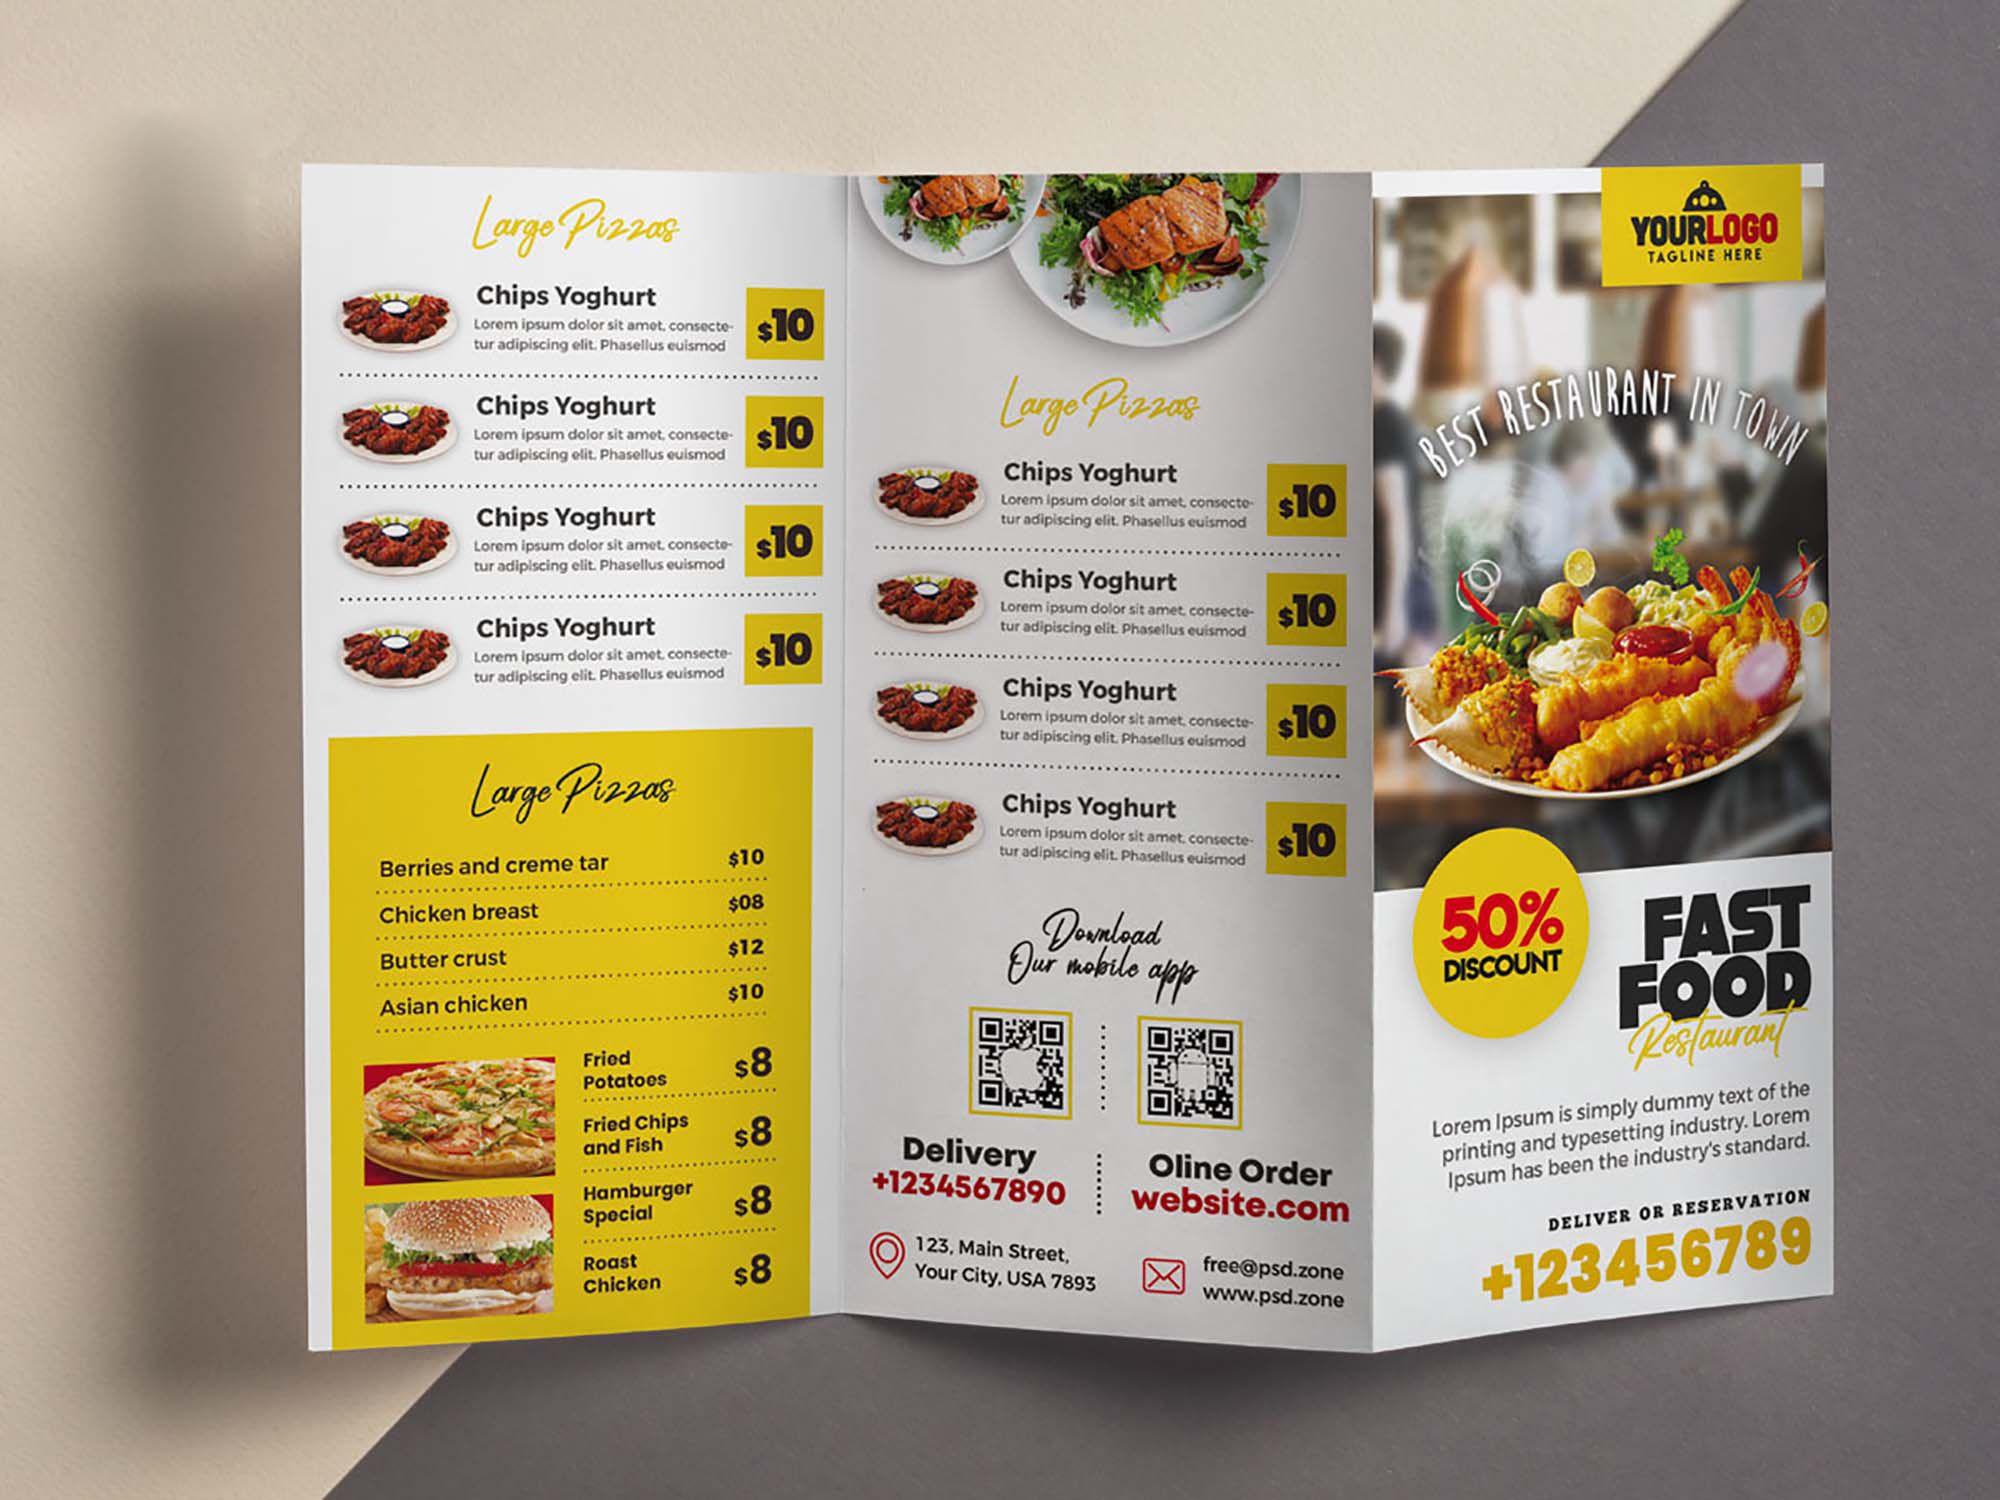 006 Imposing Tri Fold Menu Template Picture  Templates Restaurant Tri-fold Food Free PsdFull